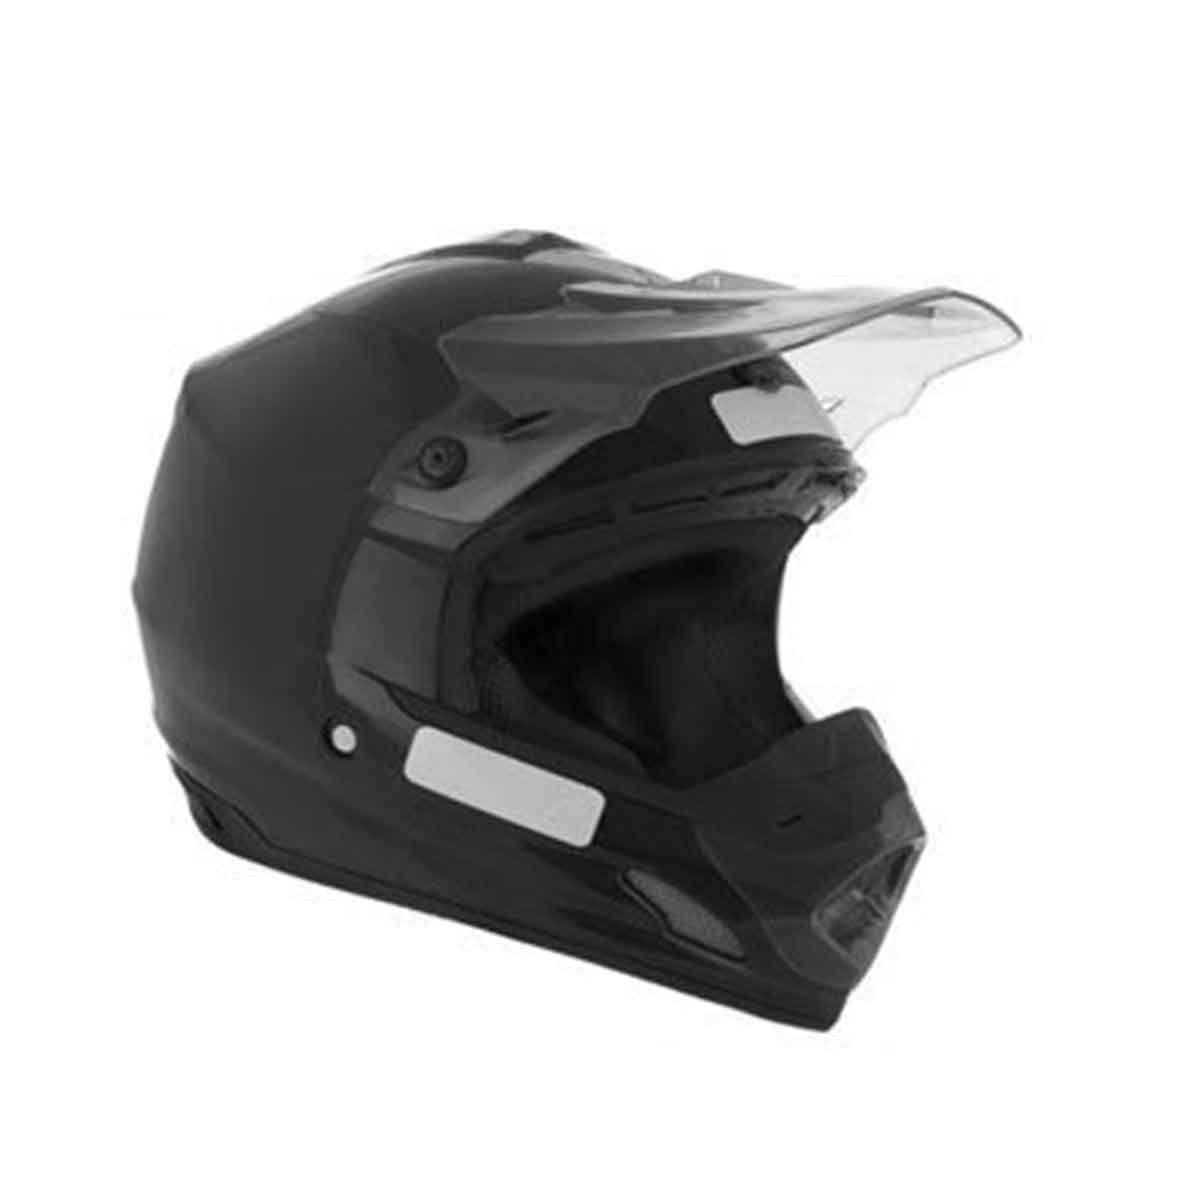 Capacete de Motocross Protork Cross TH1 Solid (Pala Fume)